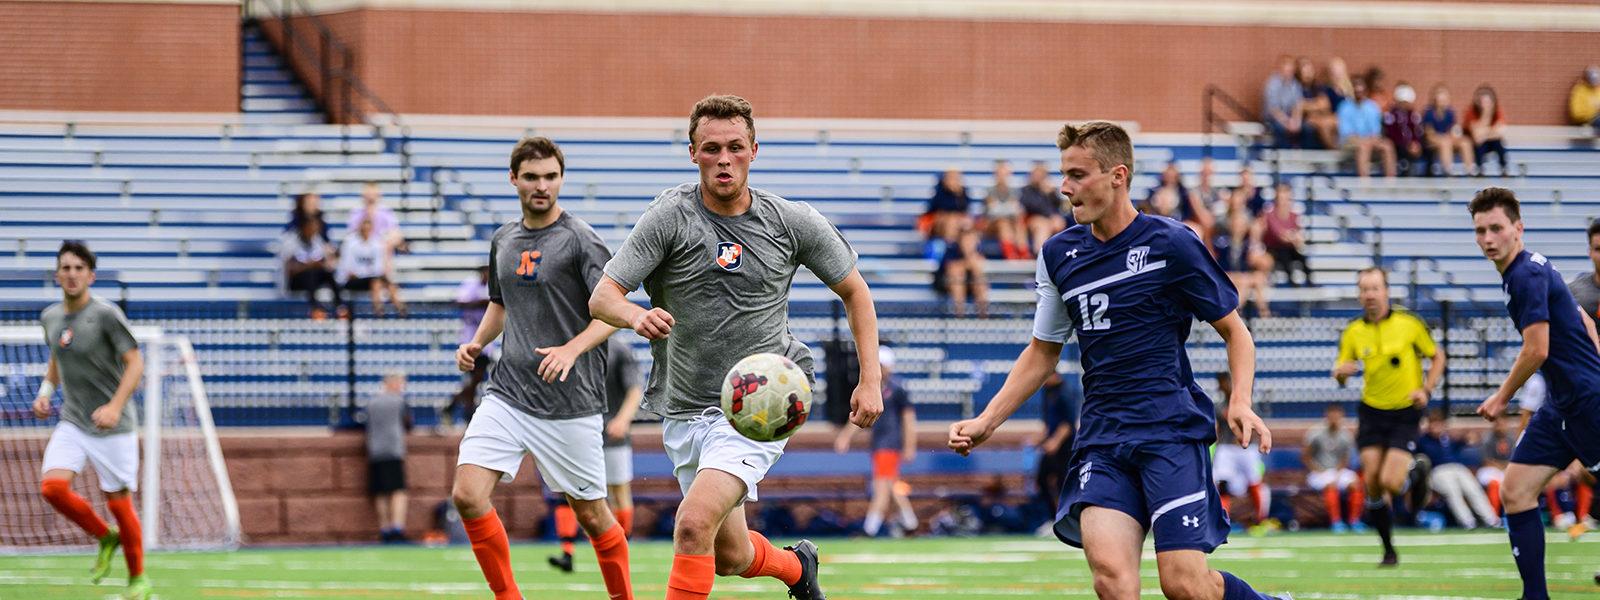 Northland College men's soccer team